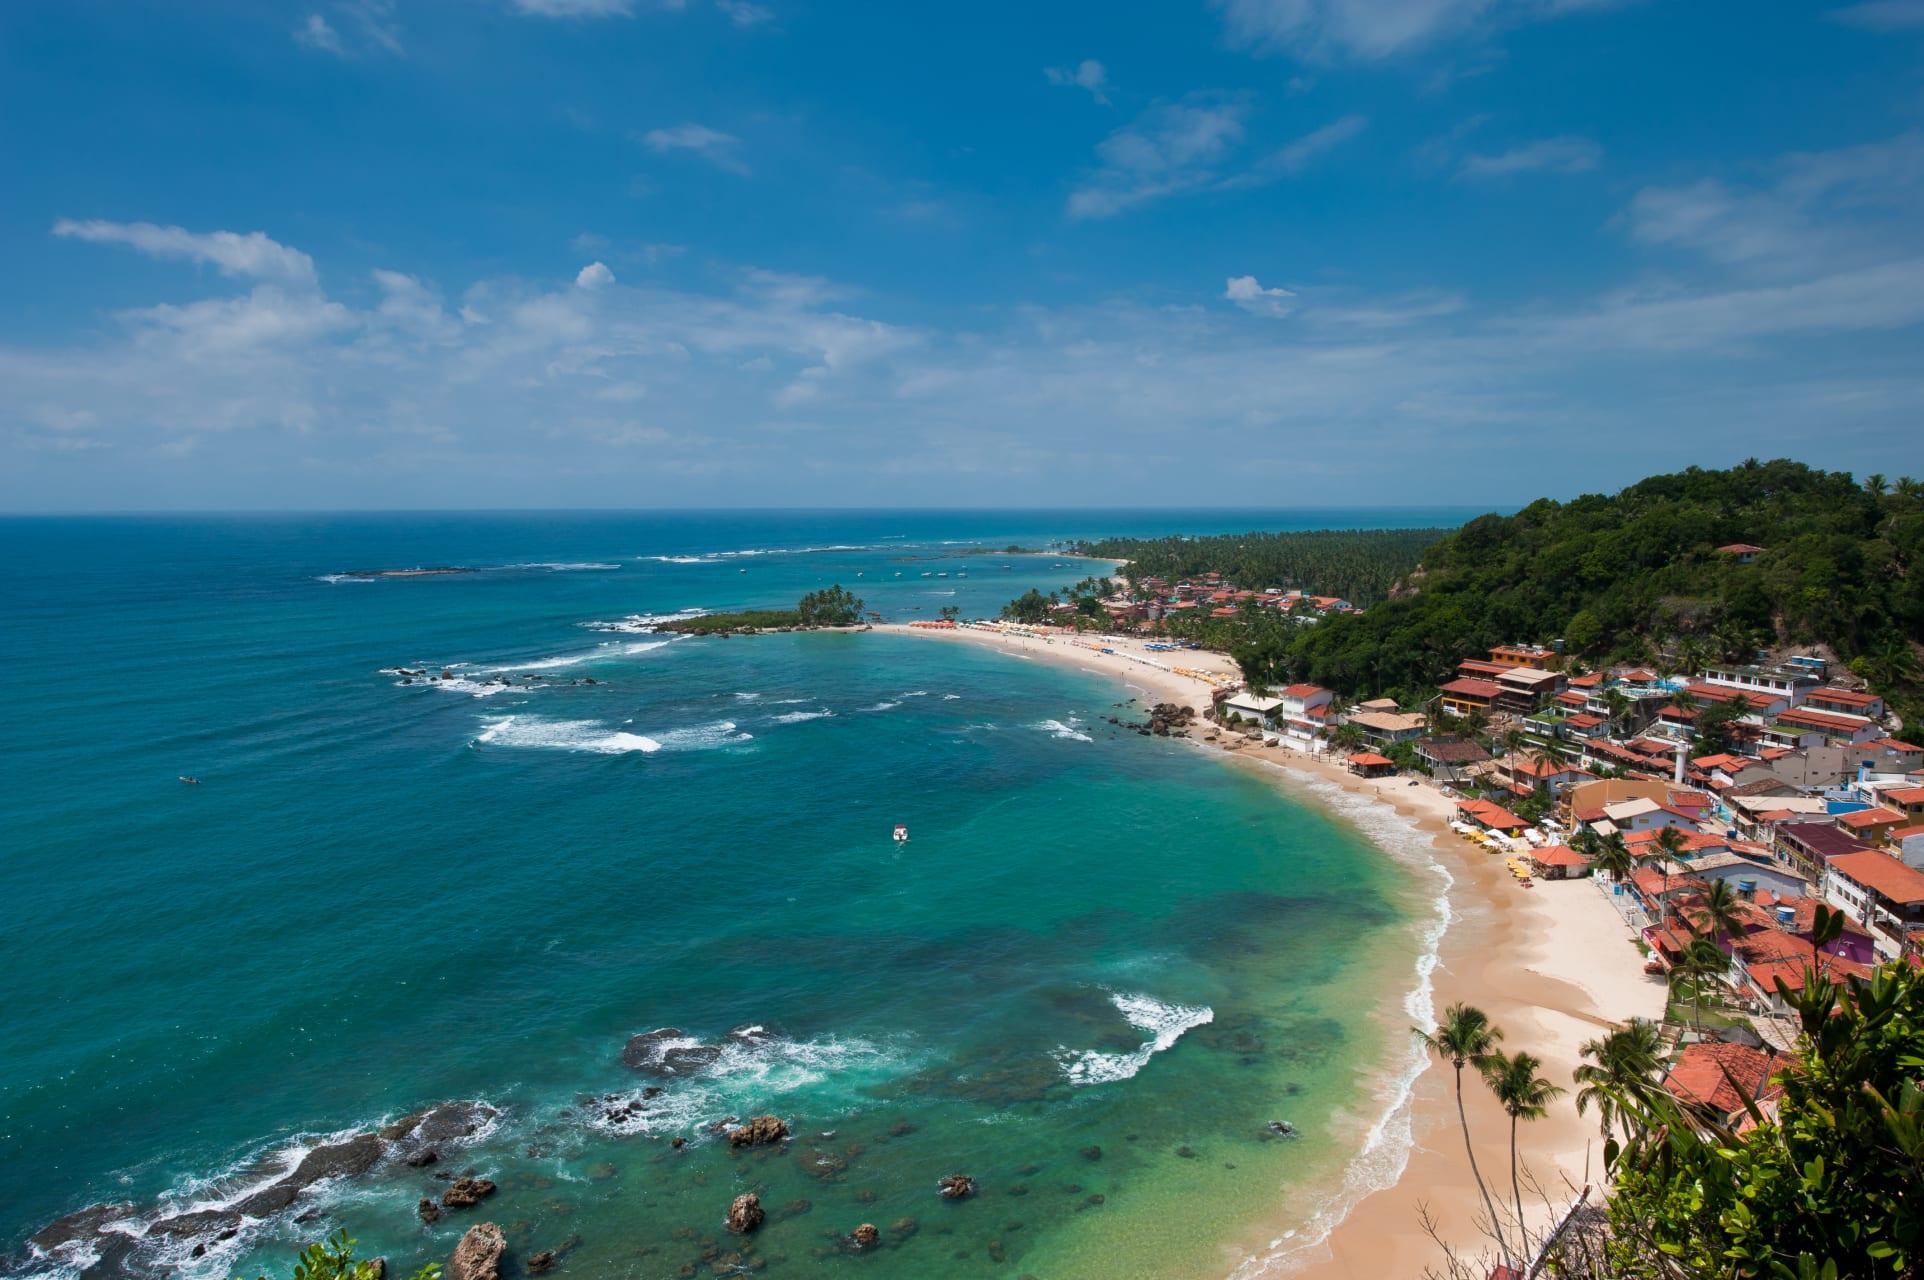 Morro de São Paulo Island - Morro de Sao Paulo 1 - Welcome to The Paradise Island in Brazil